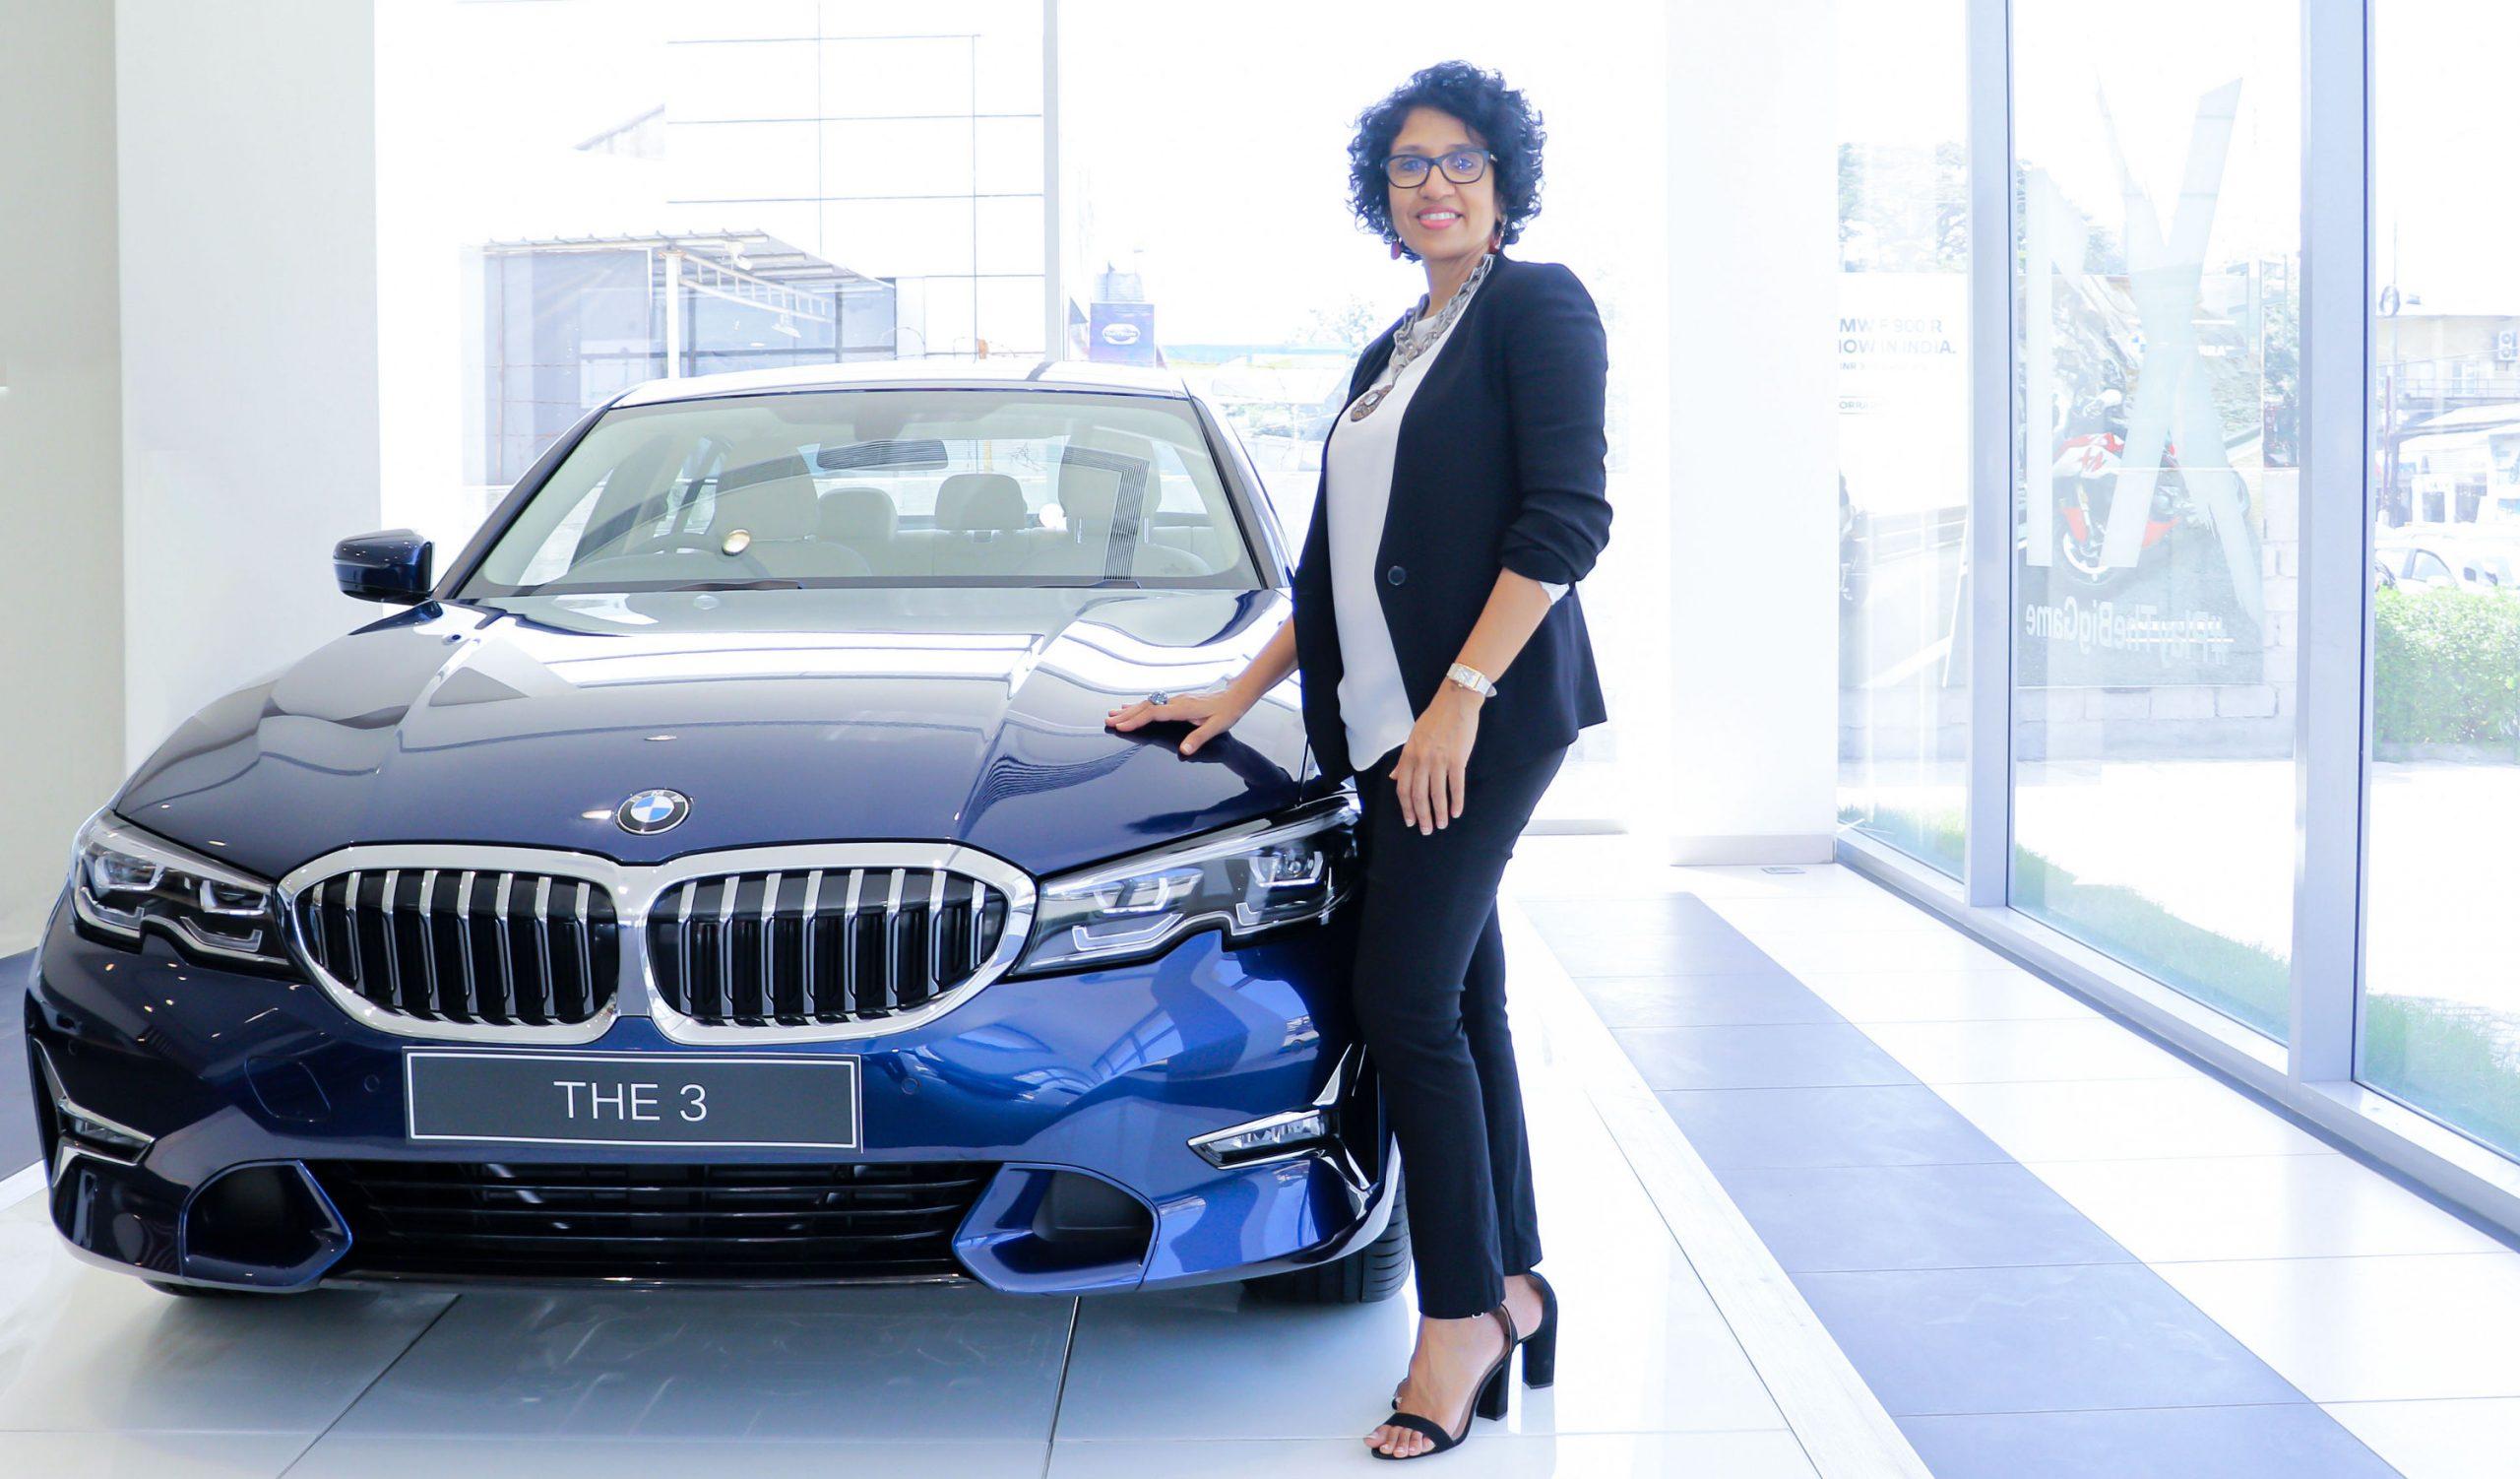 Ms Vasanthi Bhupati Dealer Principal KUN Exclusive BMW India Showroom in Chennai